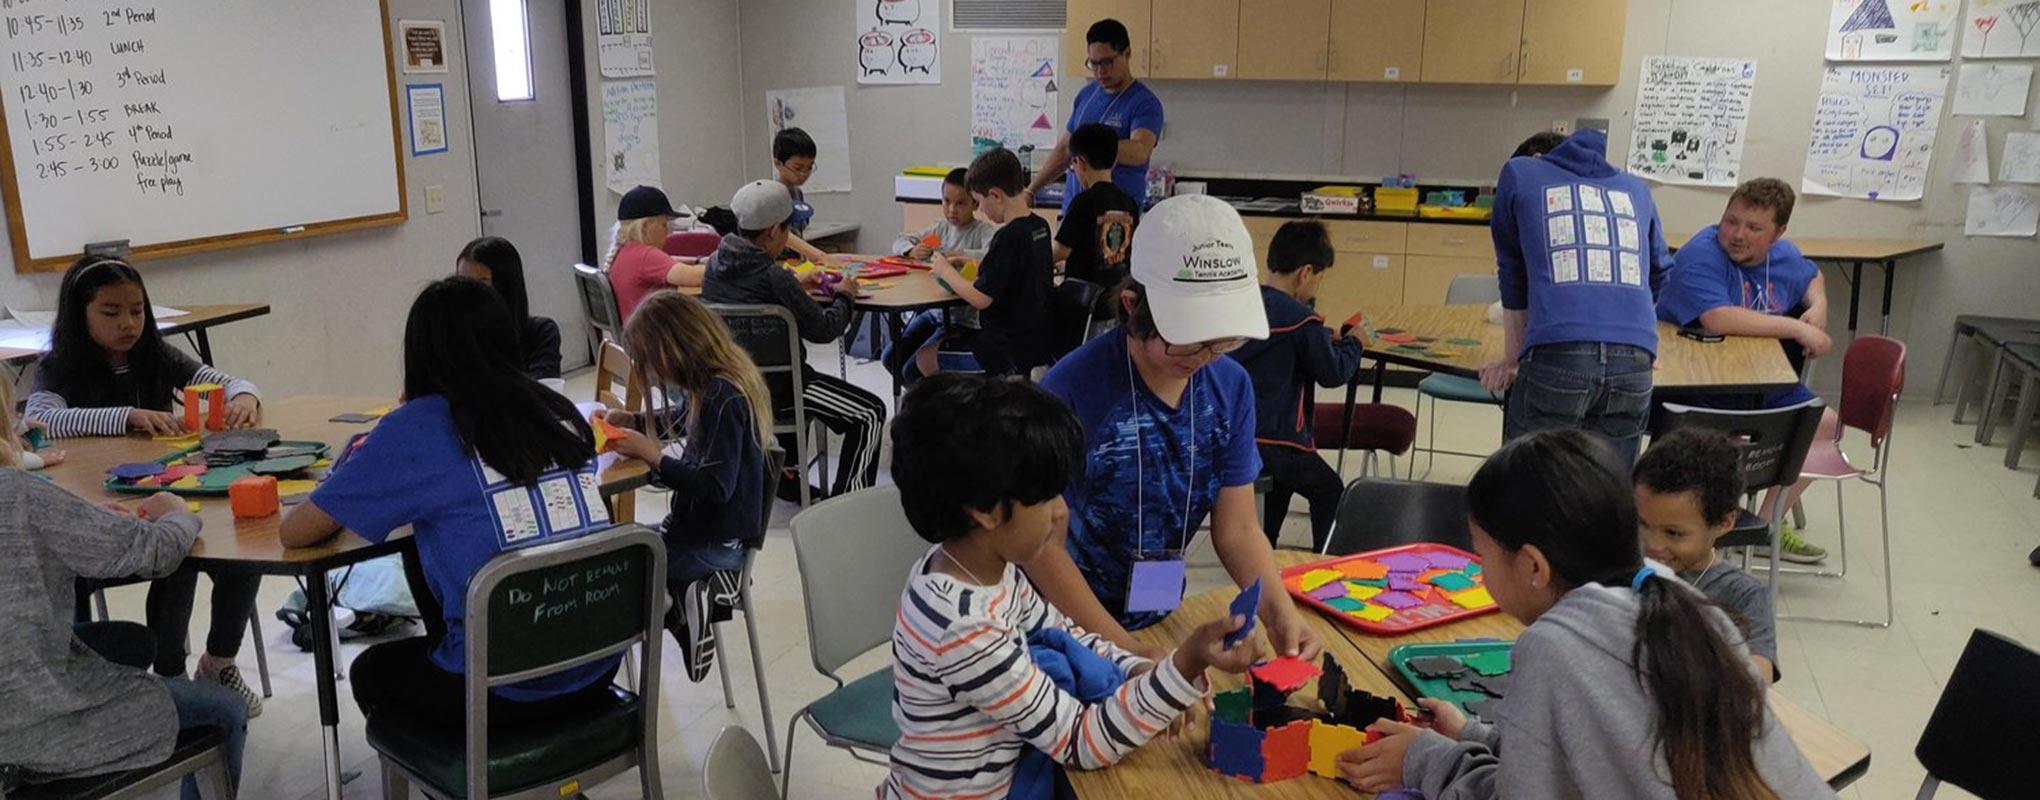 SFSU Math Circle members helping children learn